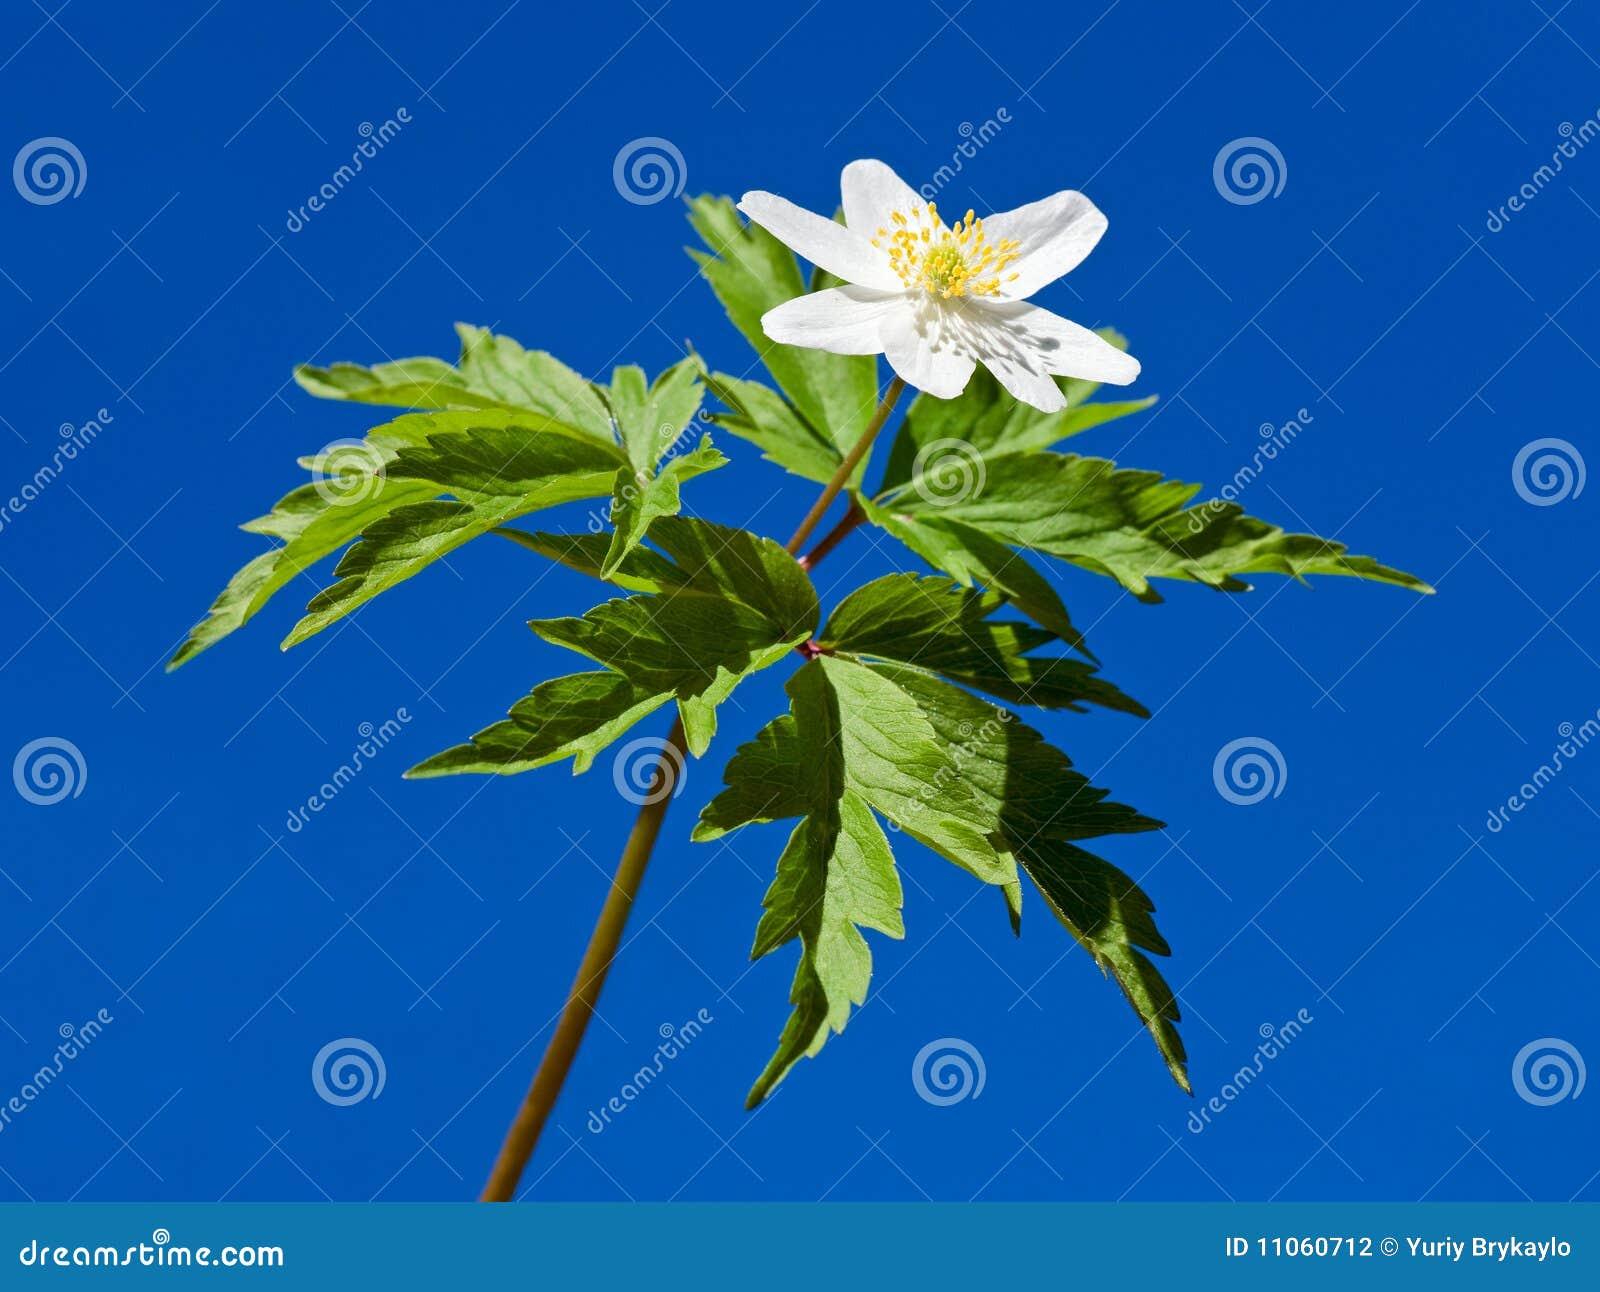 Anemone white flower on blue sky background stock photography image